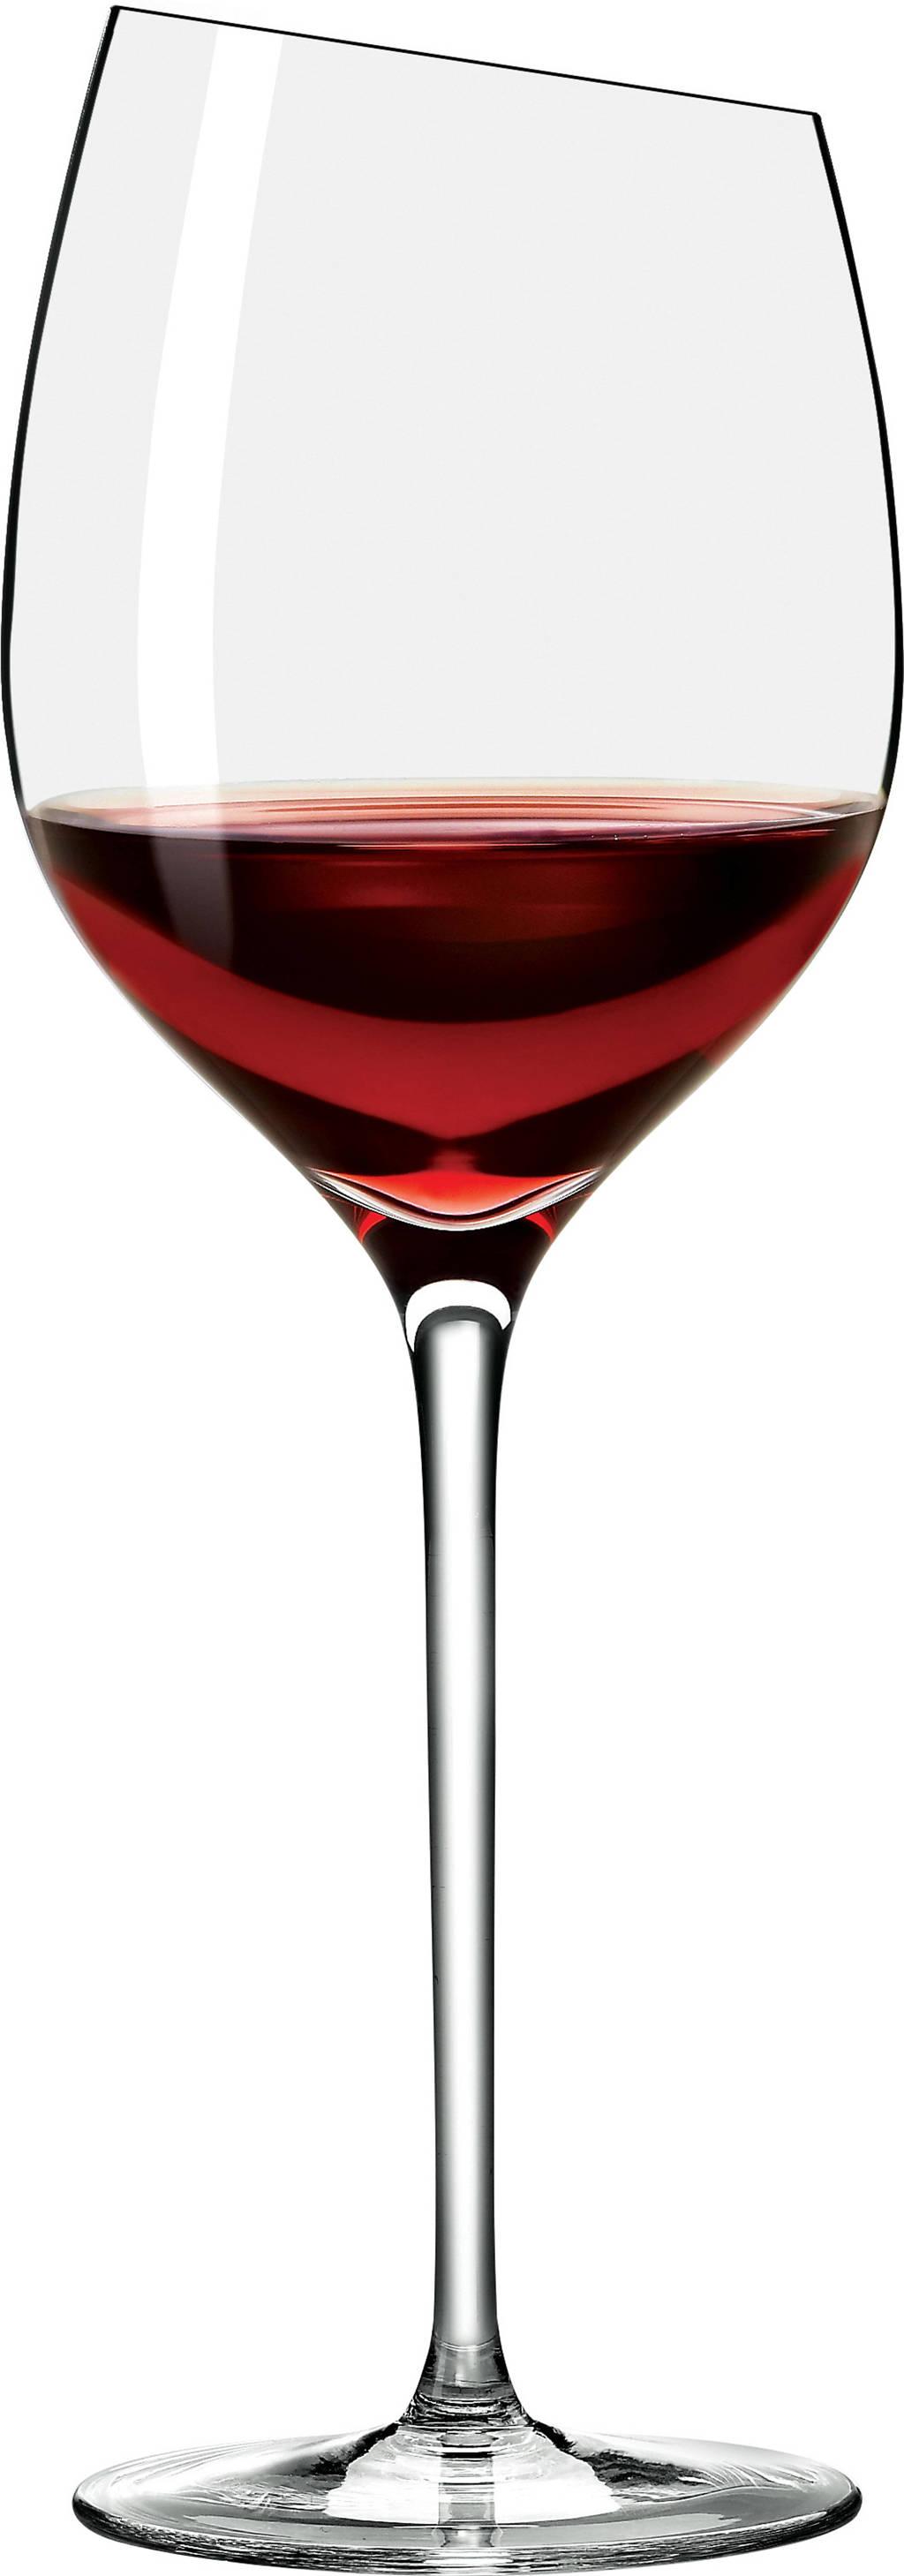 Eva Solo wijnglas bordeaux 39 cl, Transparant